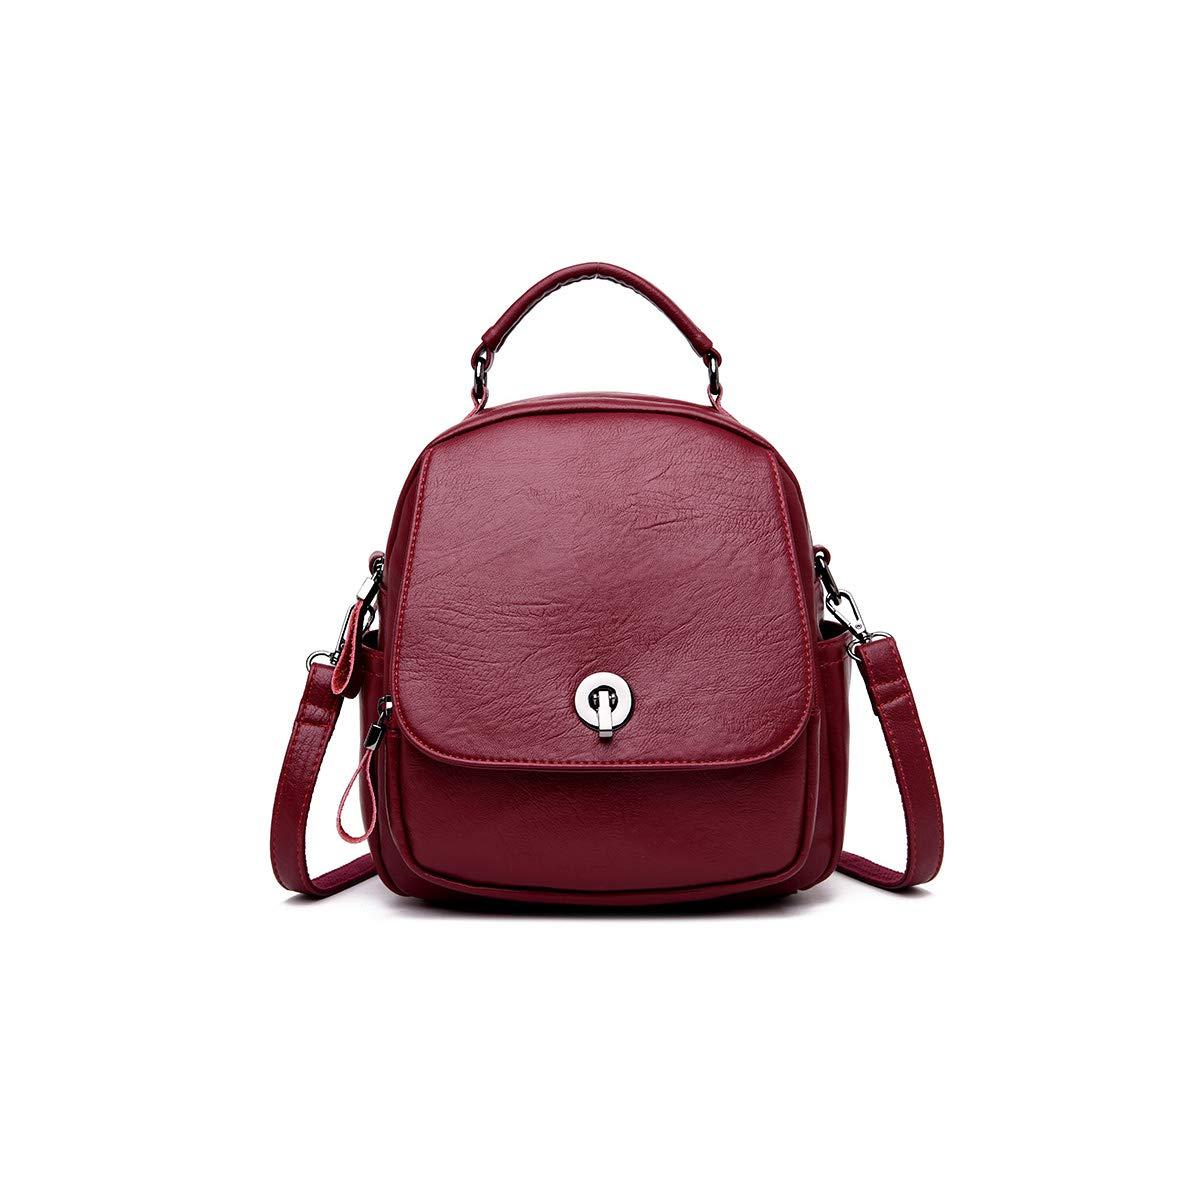 837ed5be23f5 Amazon.com: Guyuexuan Girls Multi-Purpose Backpack for Daily Travel ...